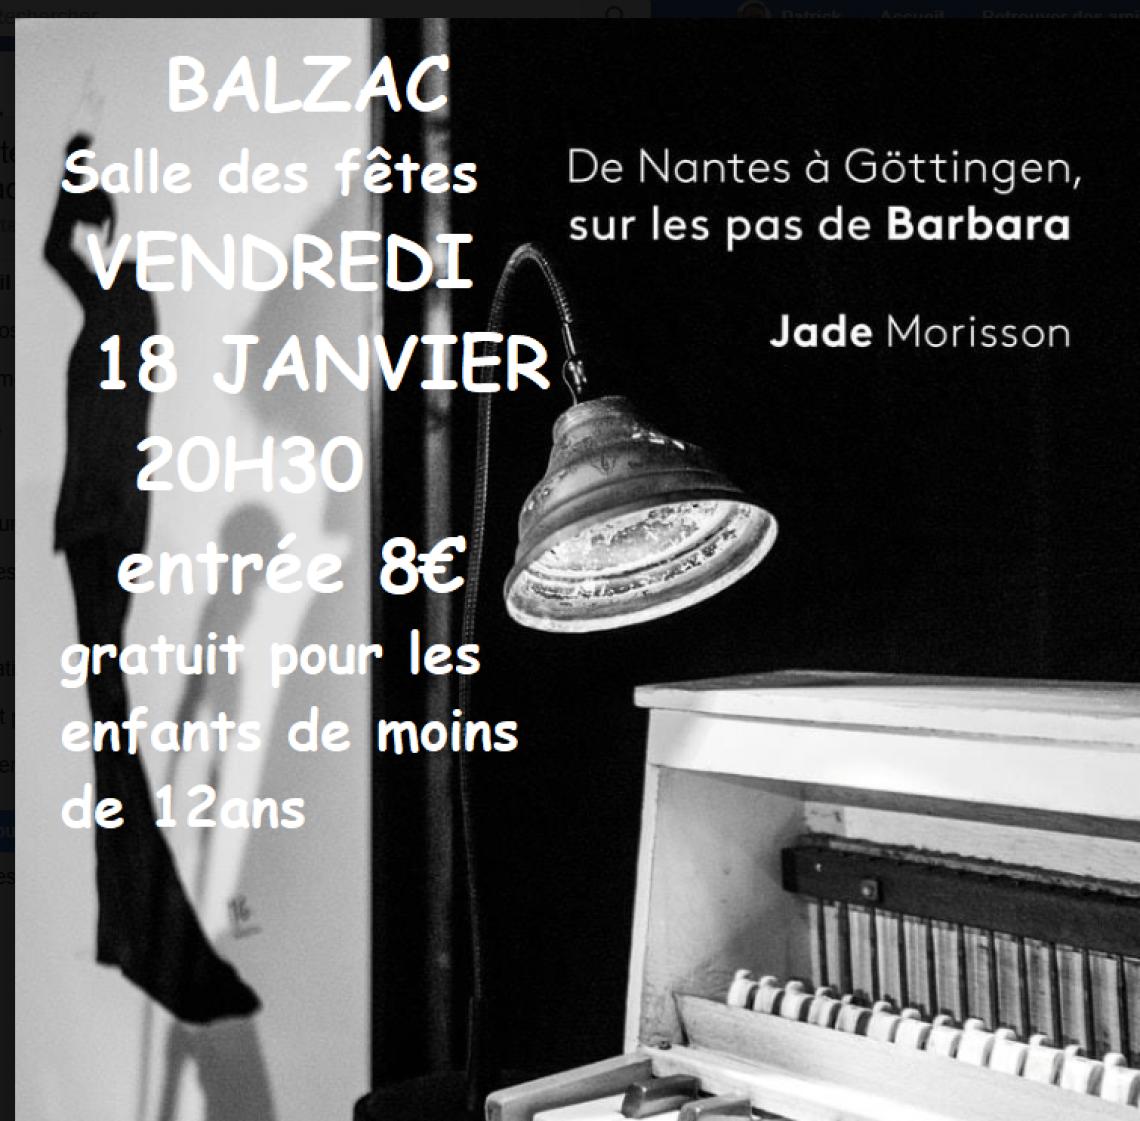 CONCERT JADE MORISSON sur les pas de BARBARA